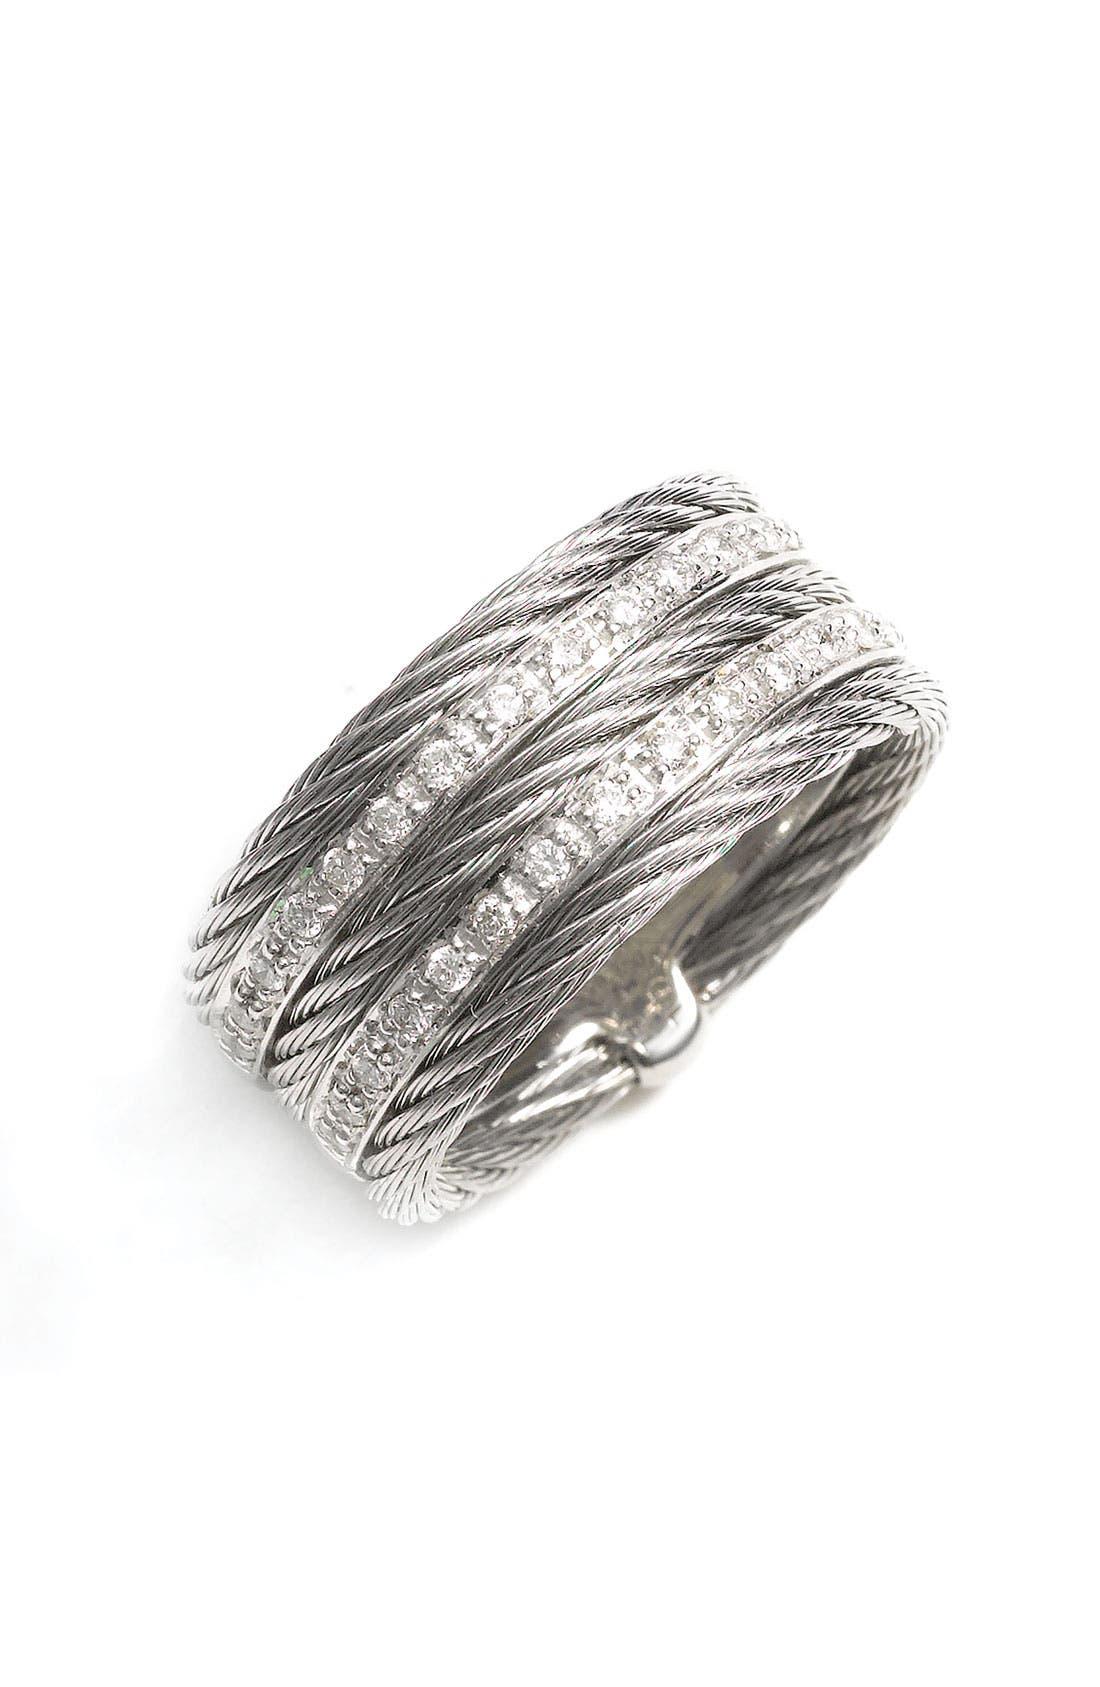 Alternate Image 1 Selected - ALOR® 5 Row Diamond Ring